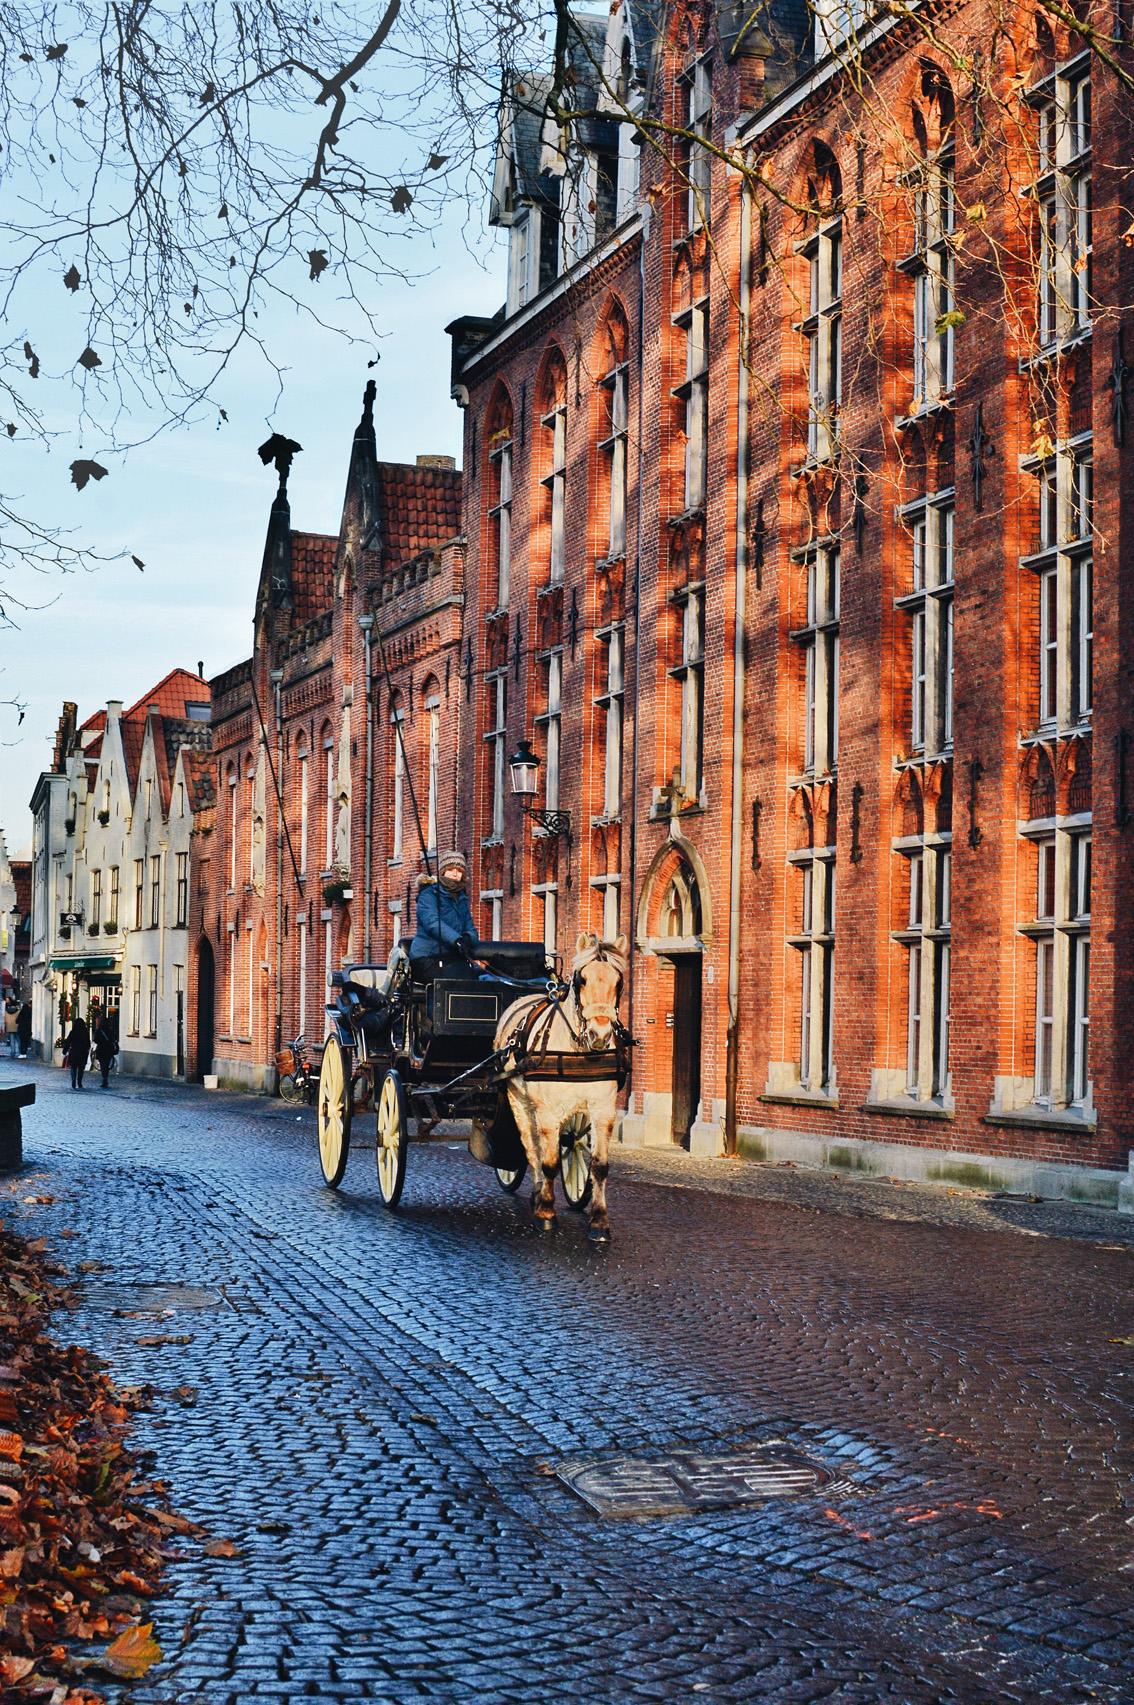 33-1 Un weekend in Belgio. Alla scoperta delle Fiandre: Bruges .